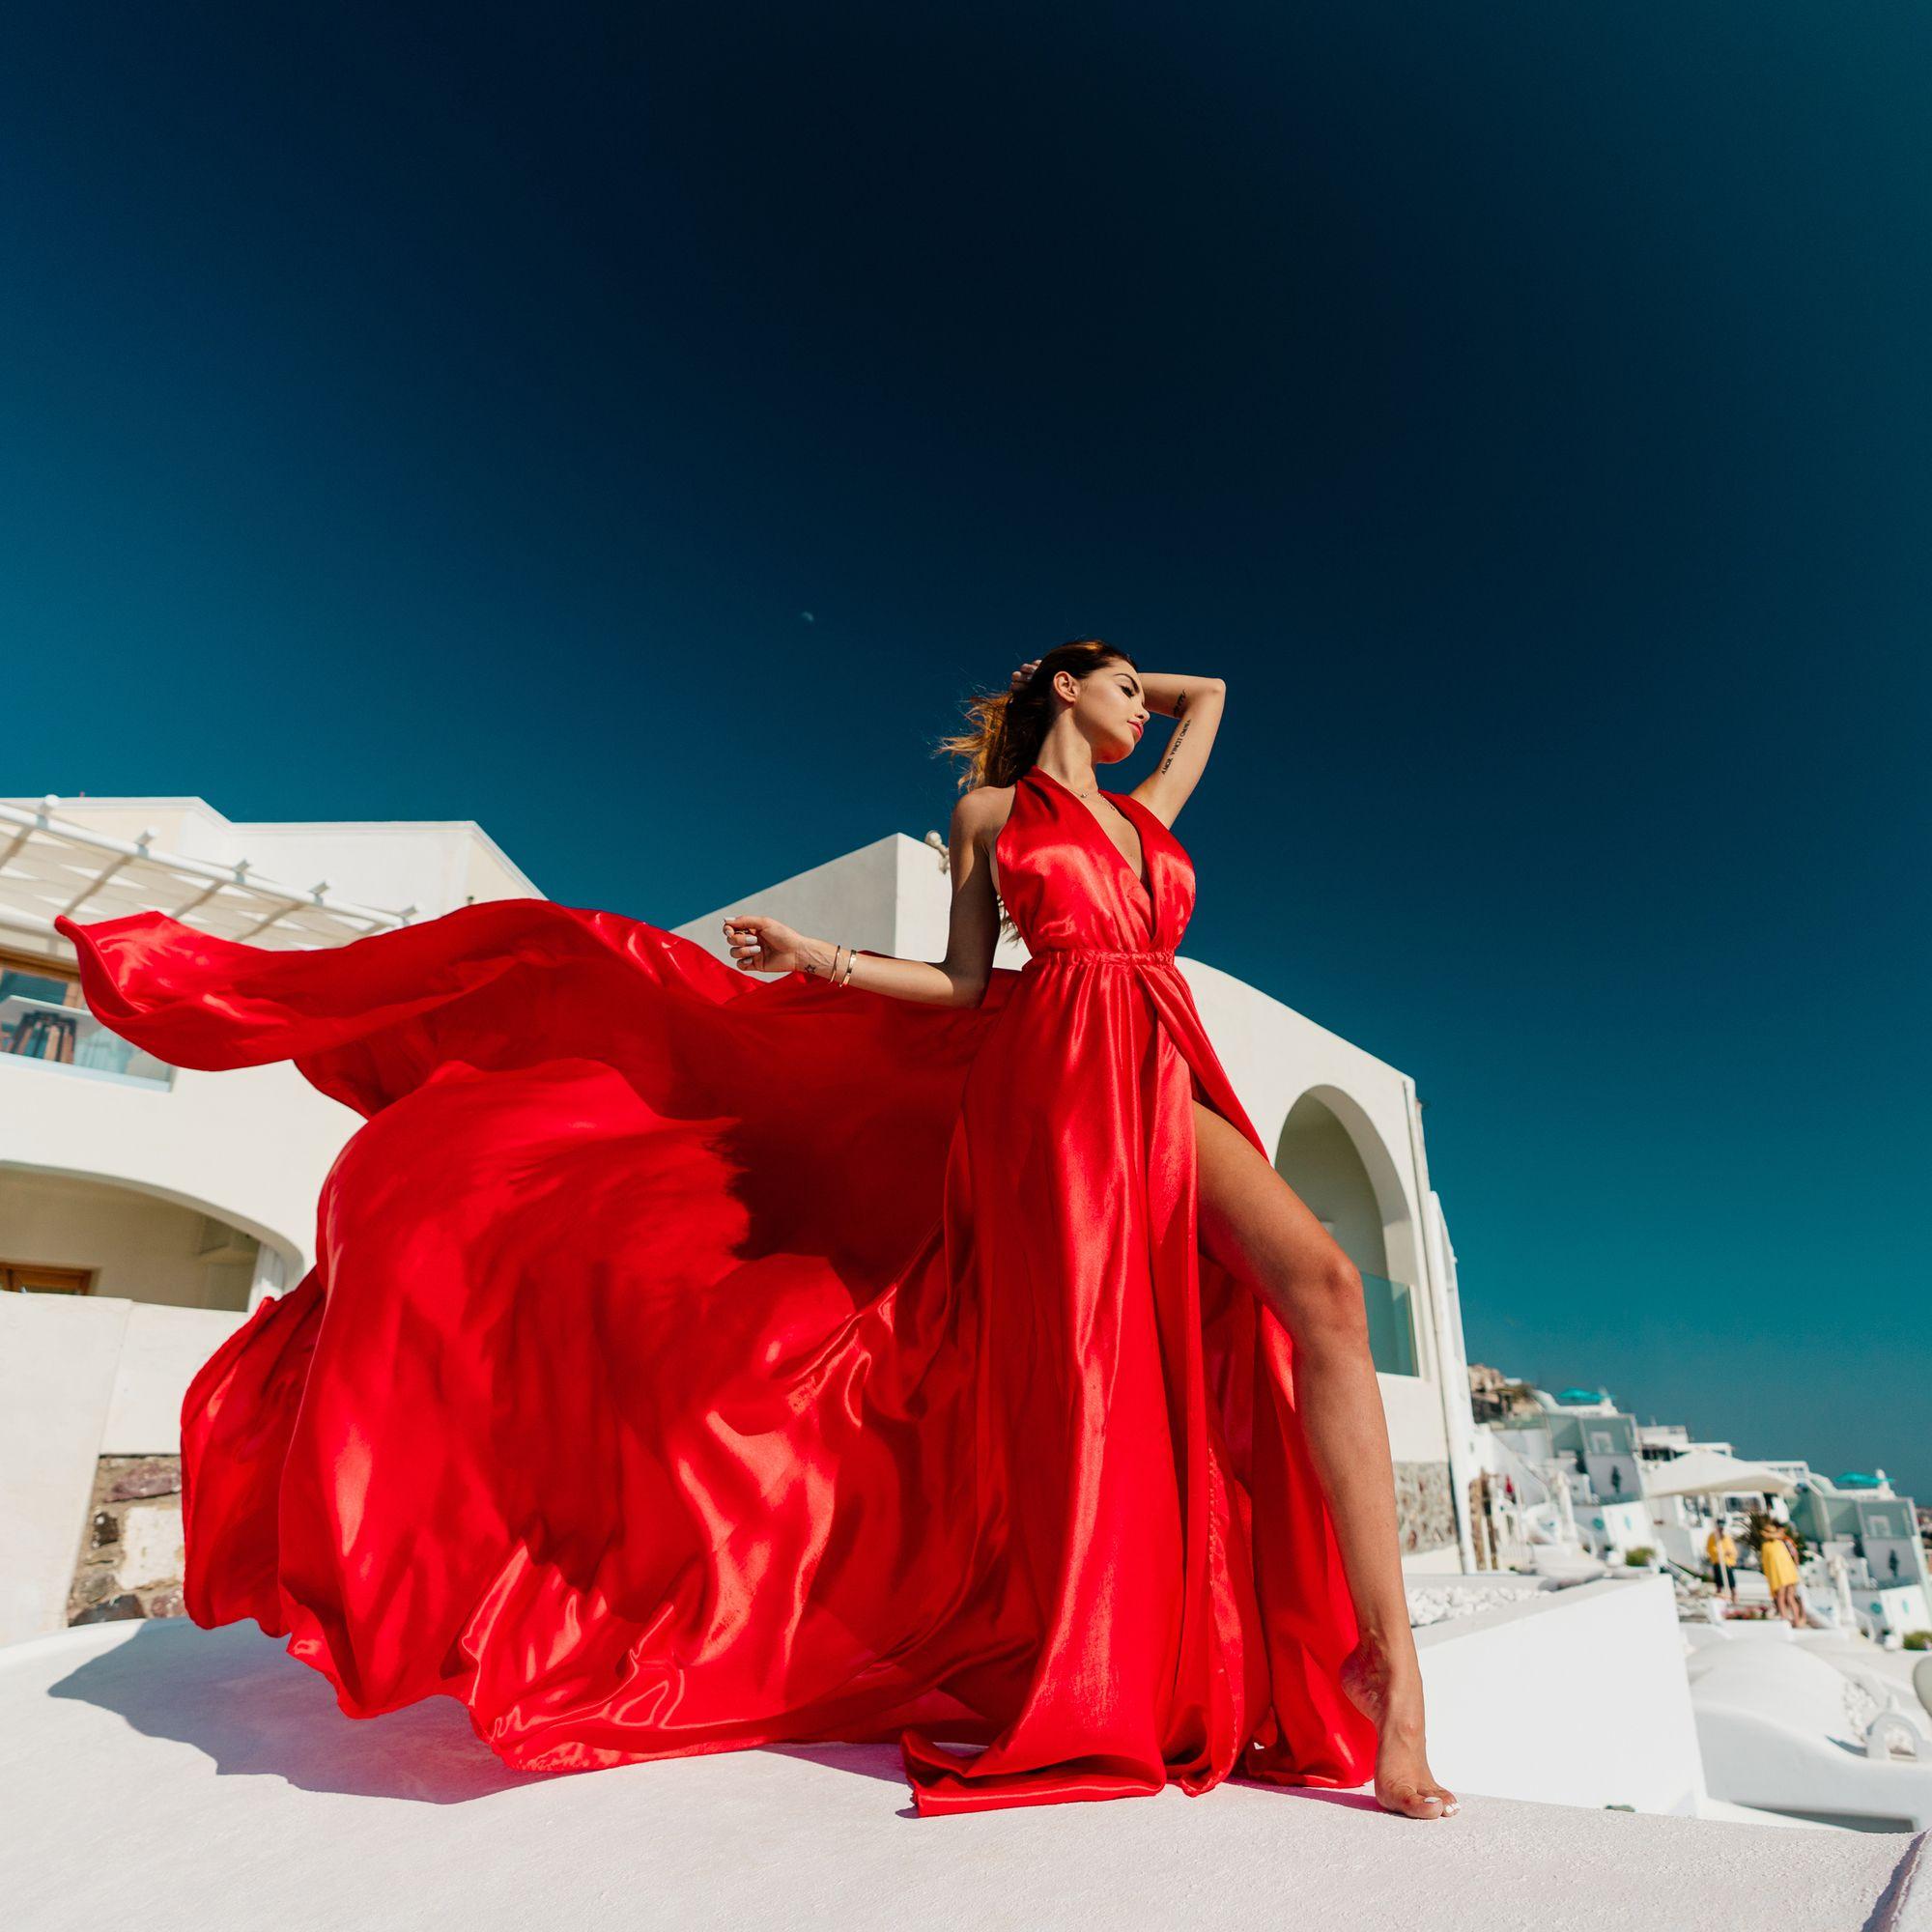 Miami Dress Photo Shooting And Rent Flying Dresses In Santorini Mykonos Miami Miami Dresses Fashion Photography Inspiration Rent Dresses